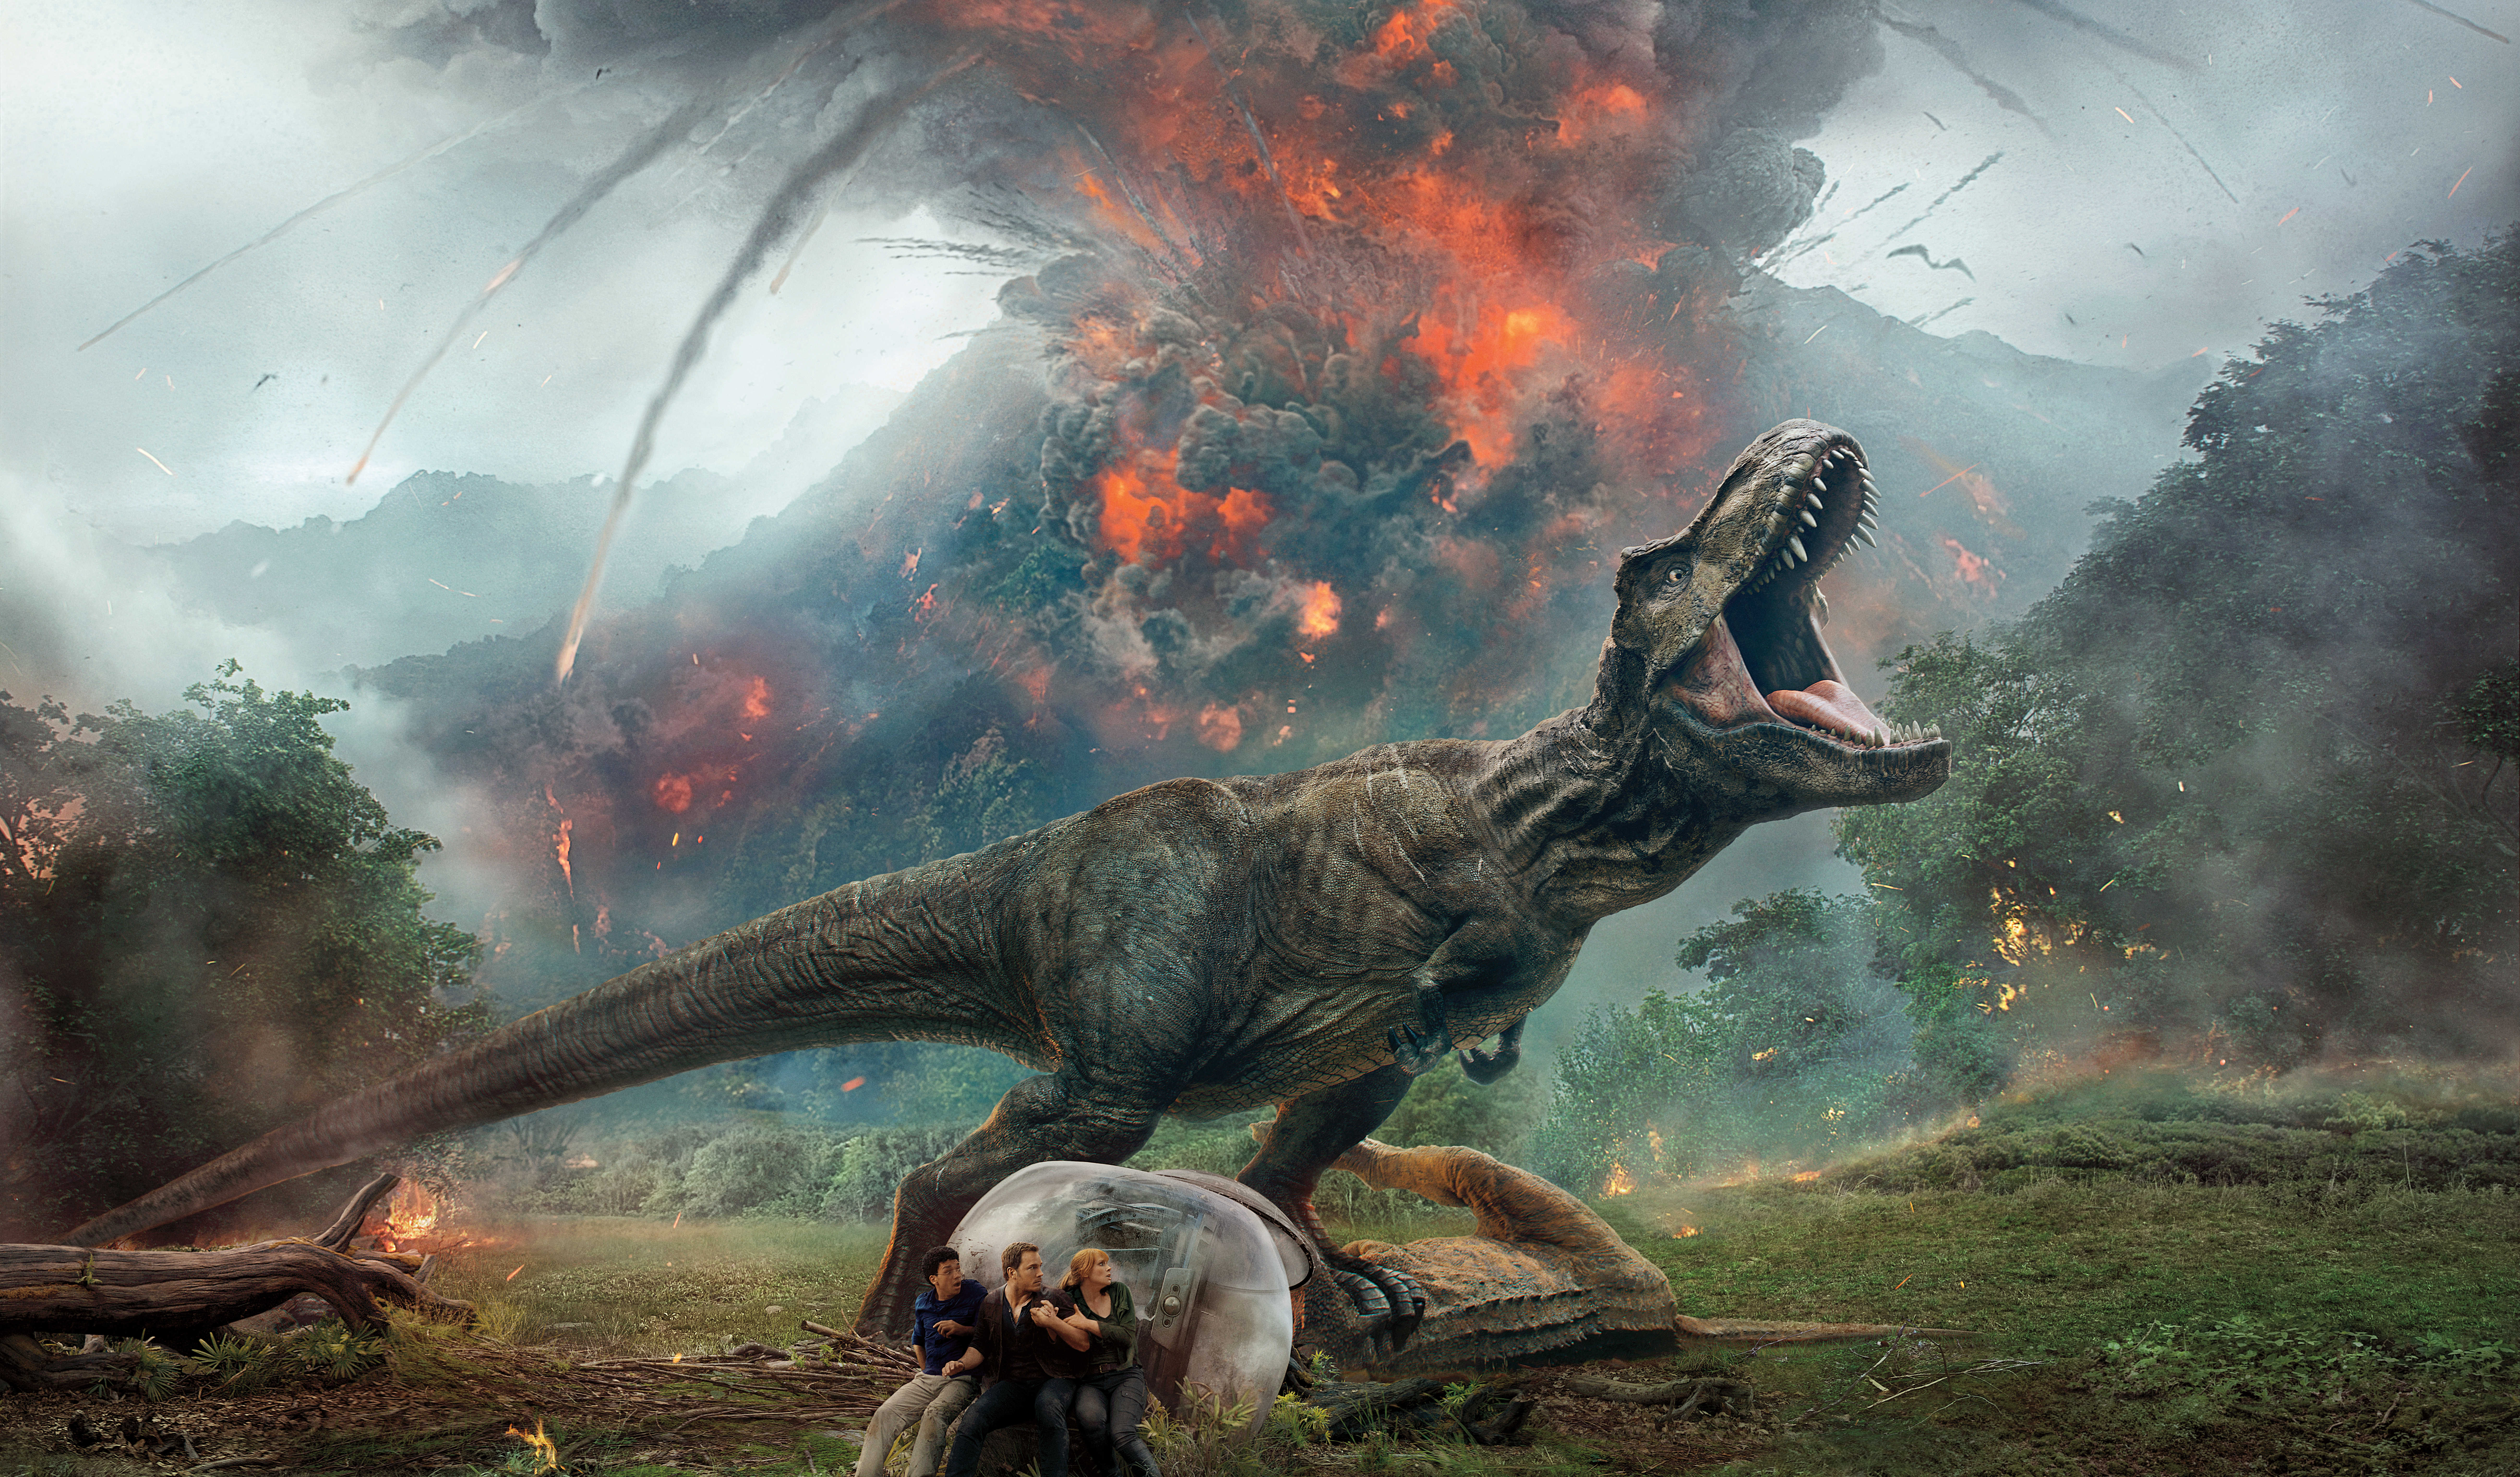 Jurassic World Fallen Kingdom 2018 Movie Poster Wallpaper ...